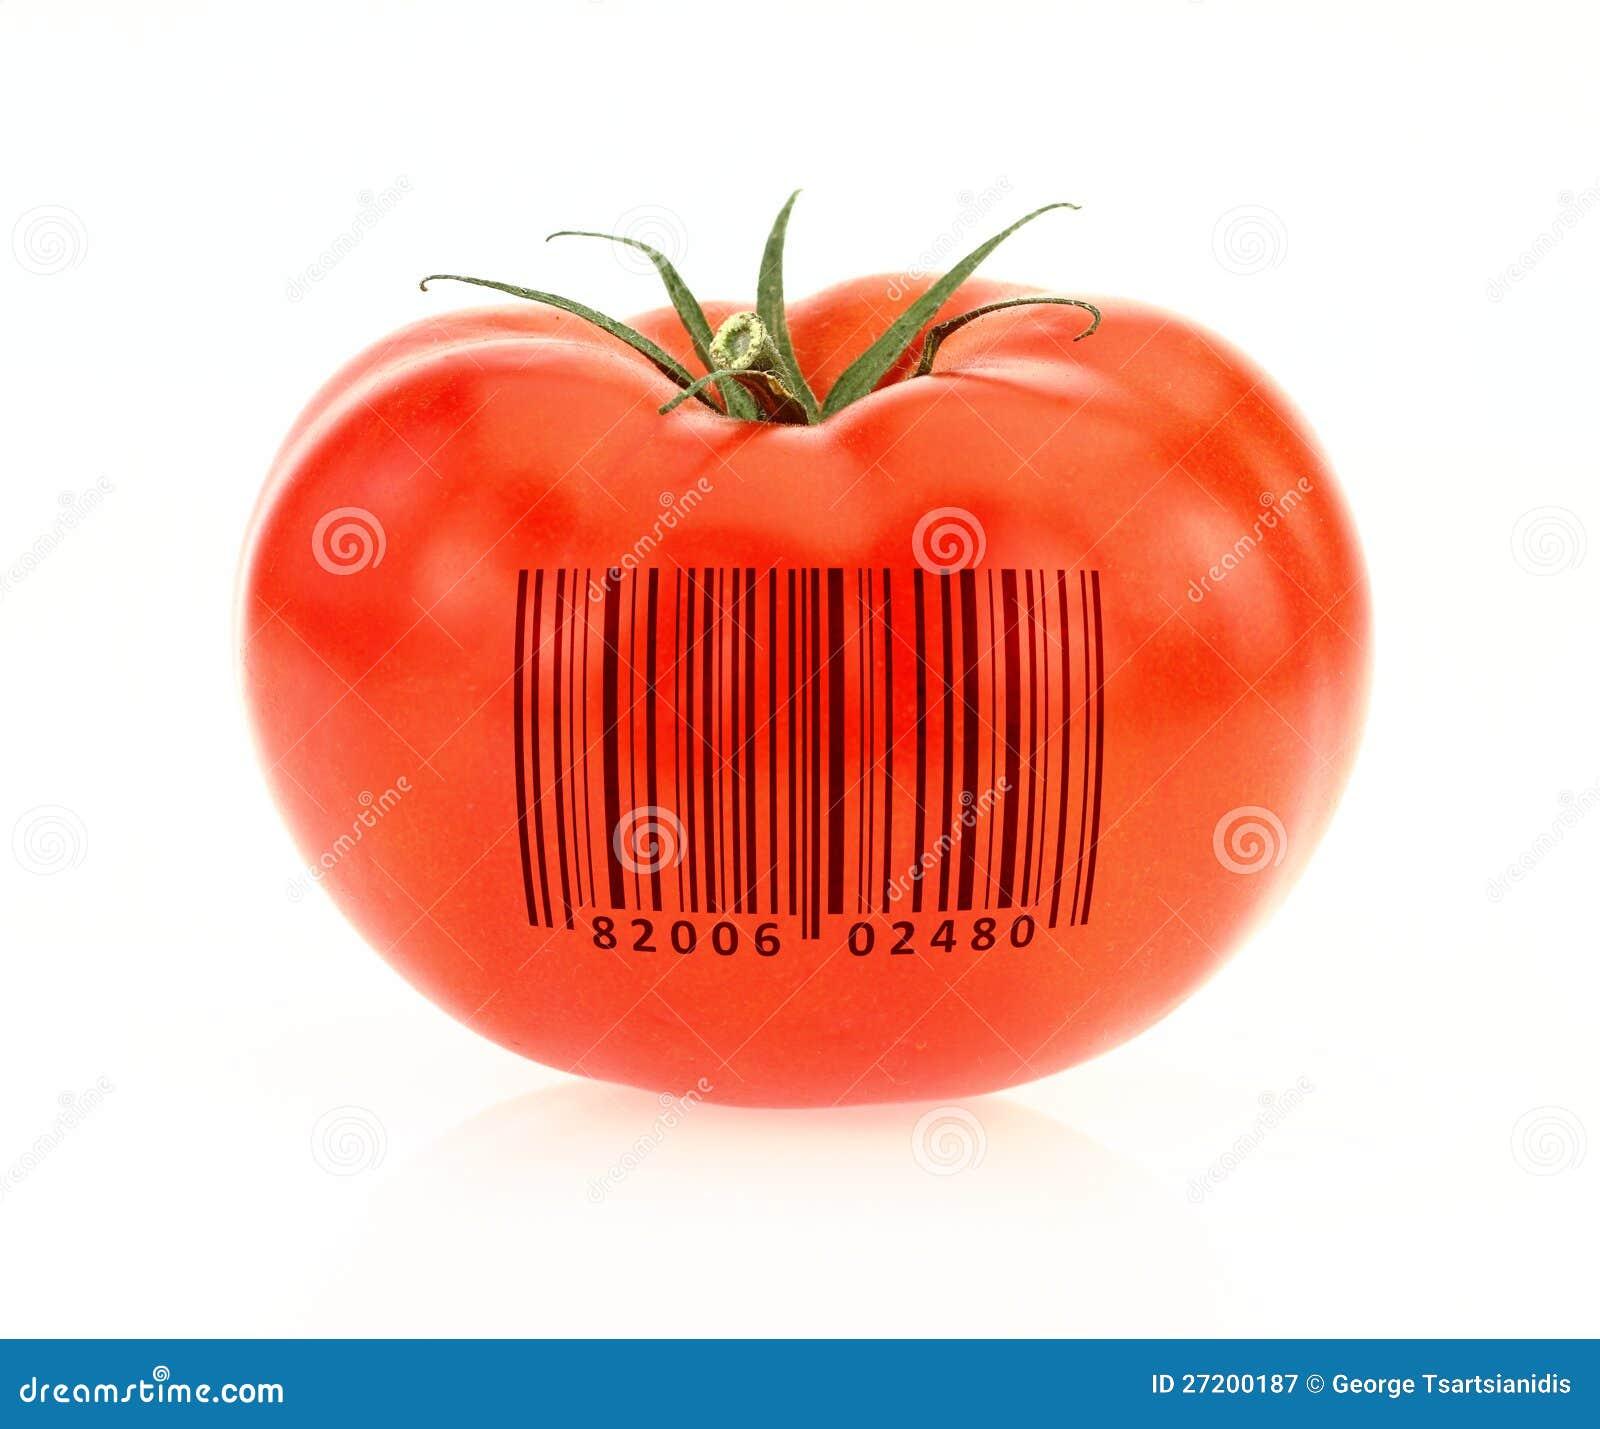 Tomato coded